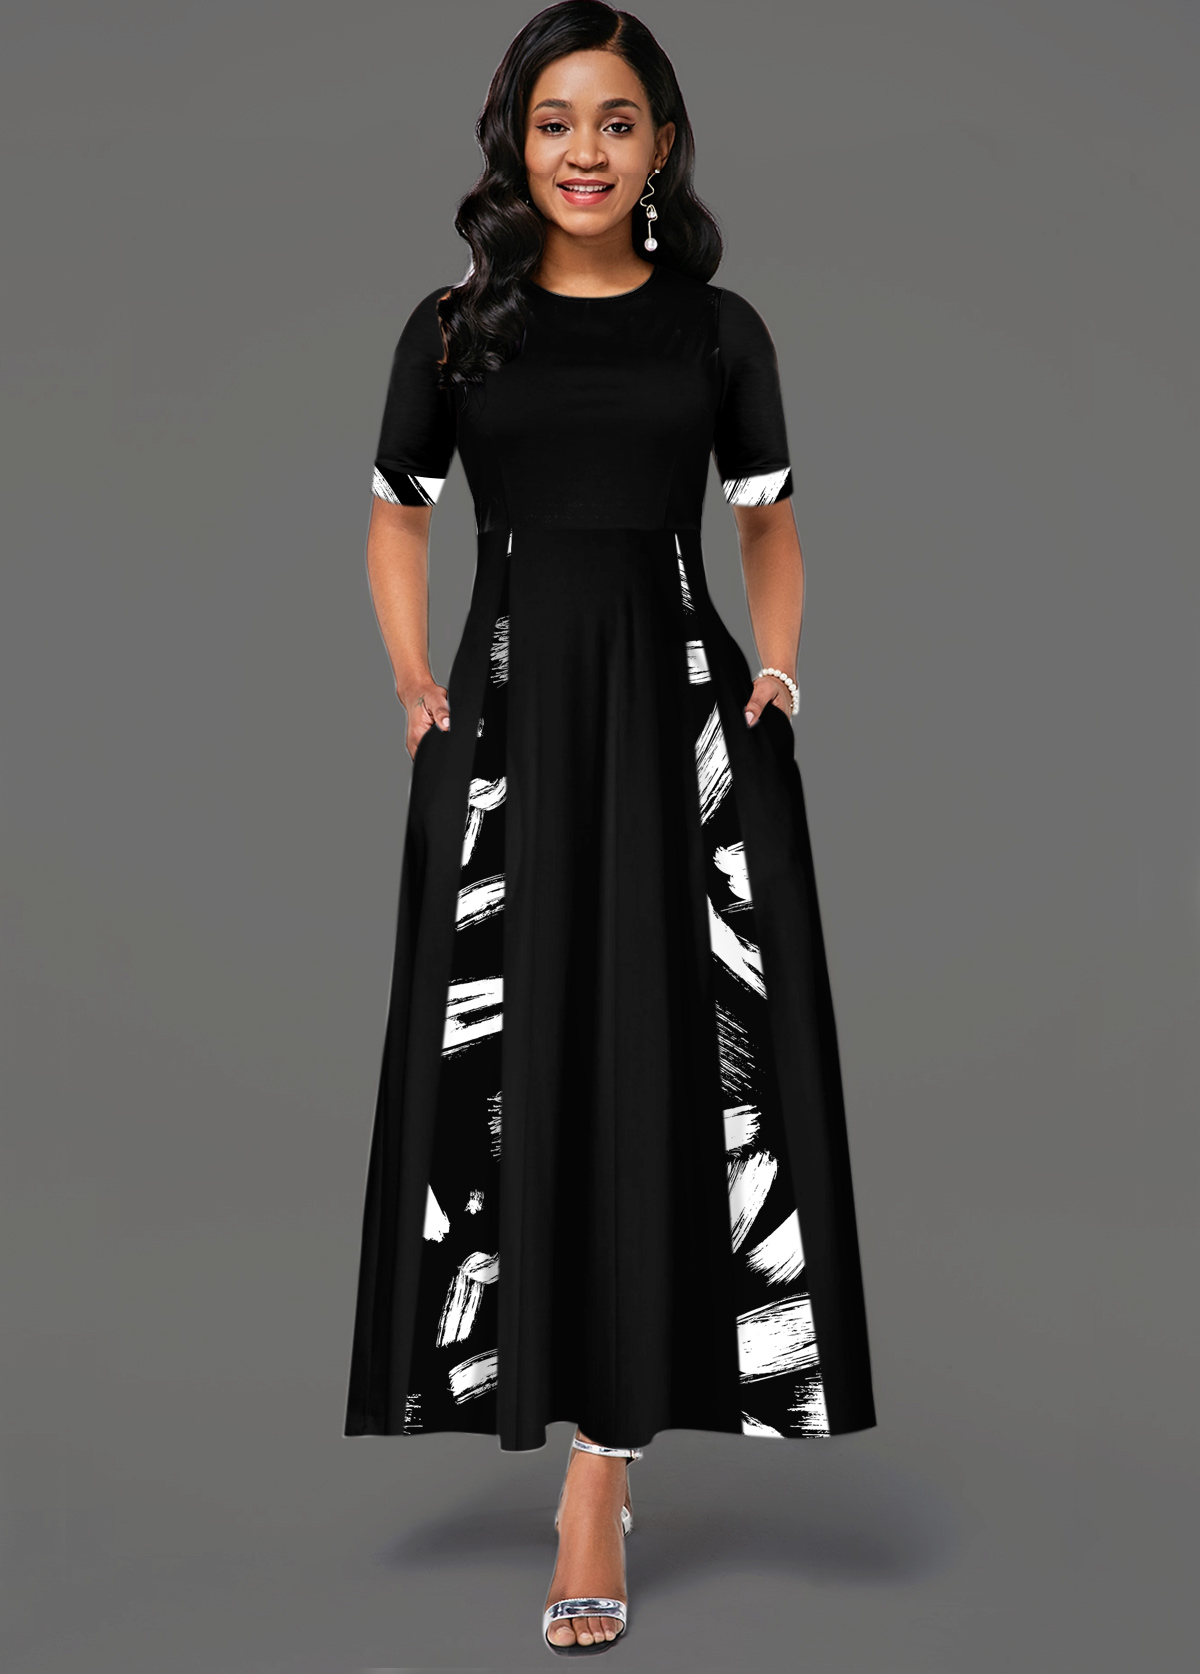 Printed Round Neck Short Sleeve Pocket Dress